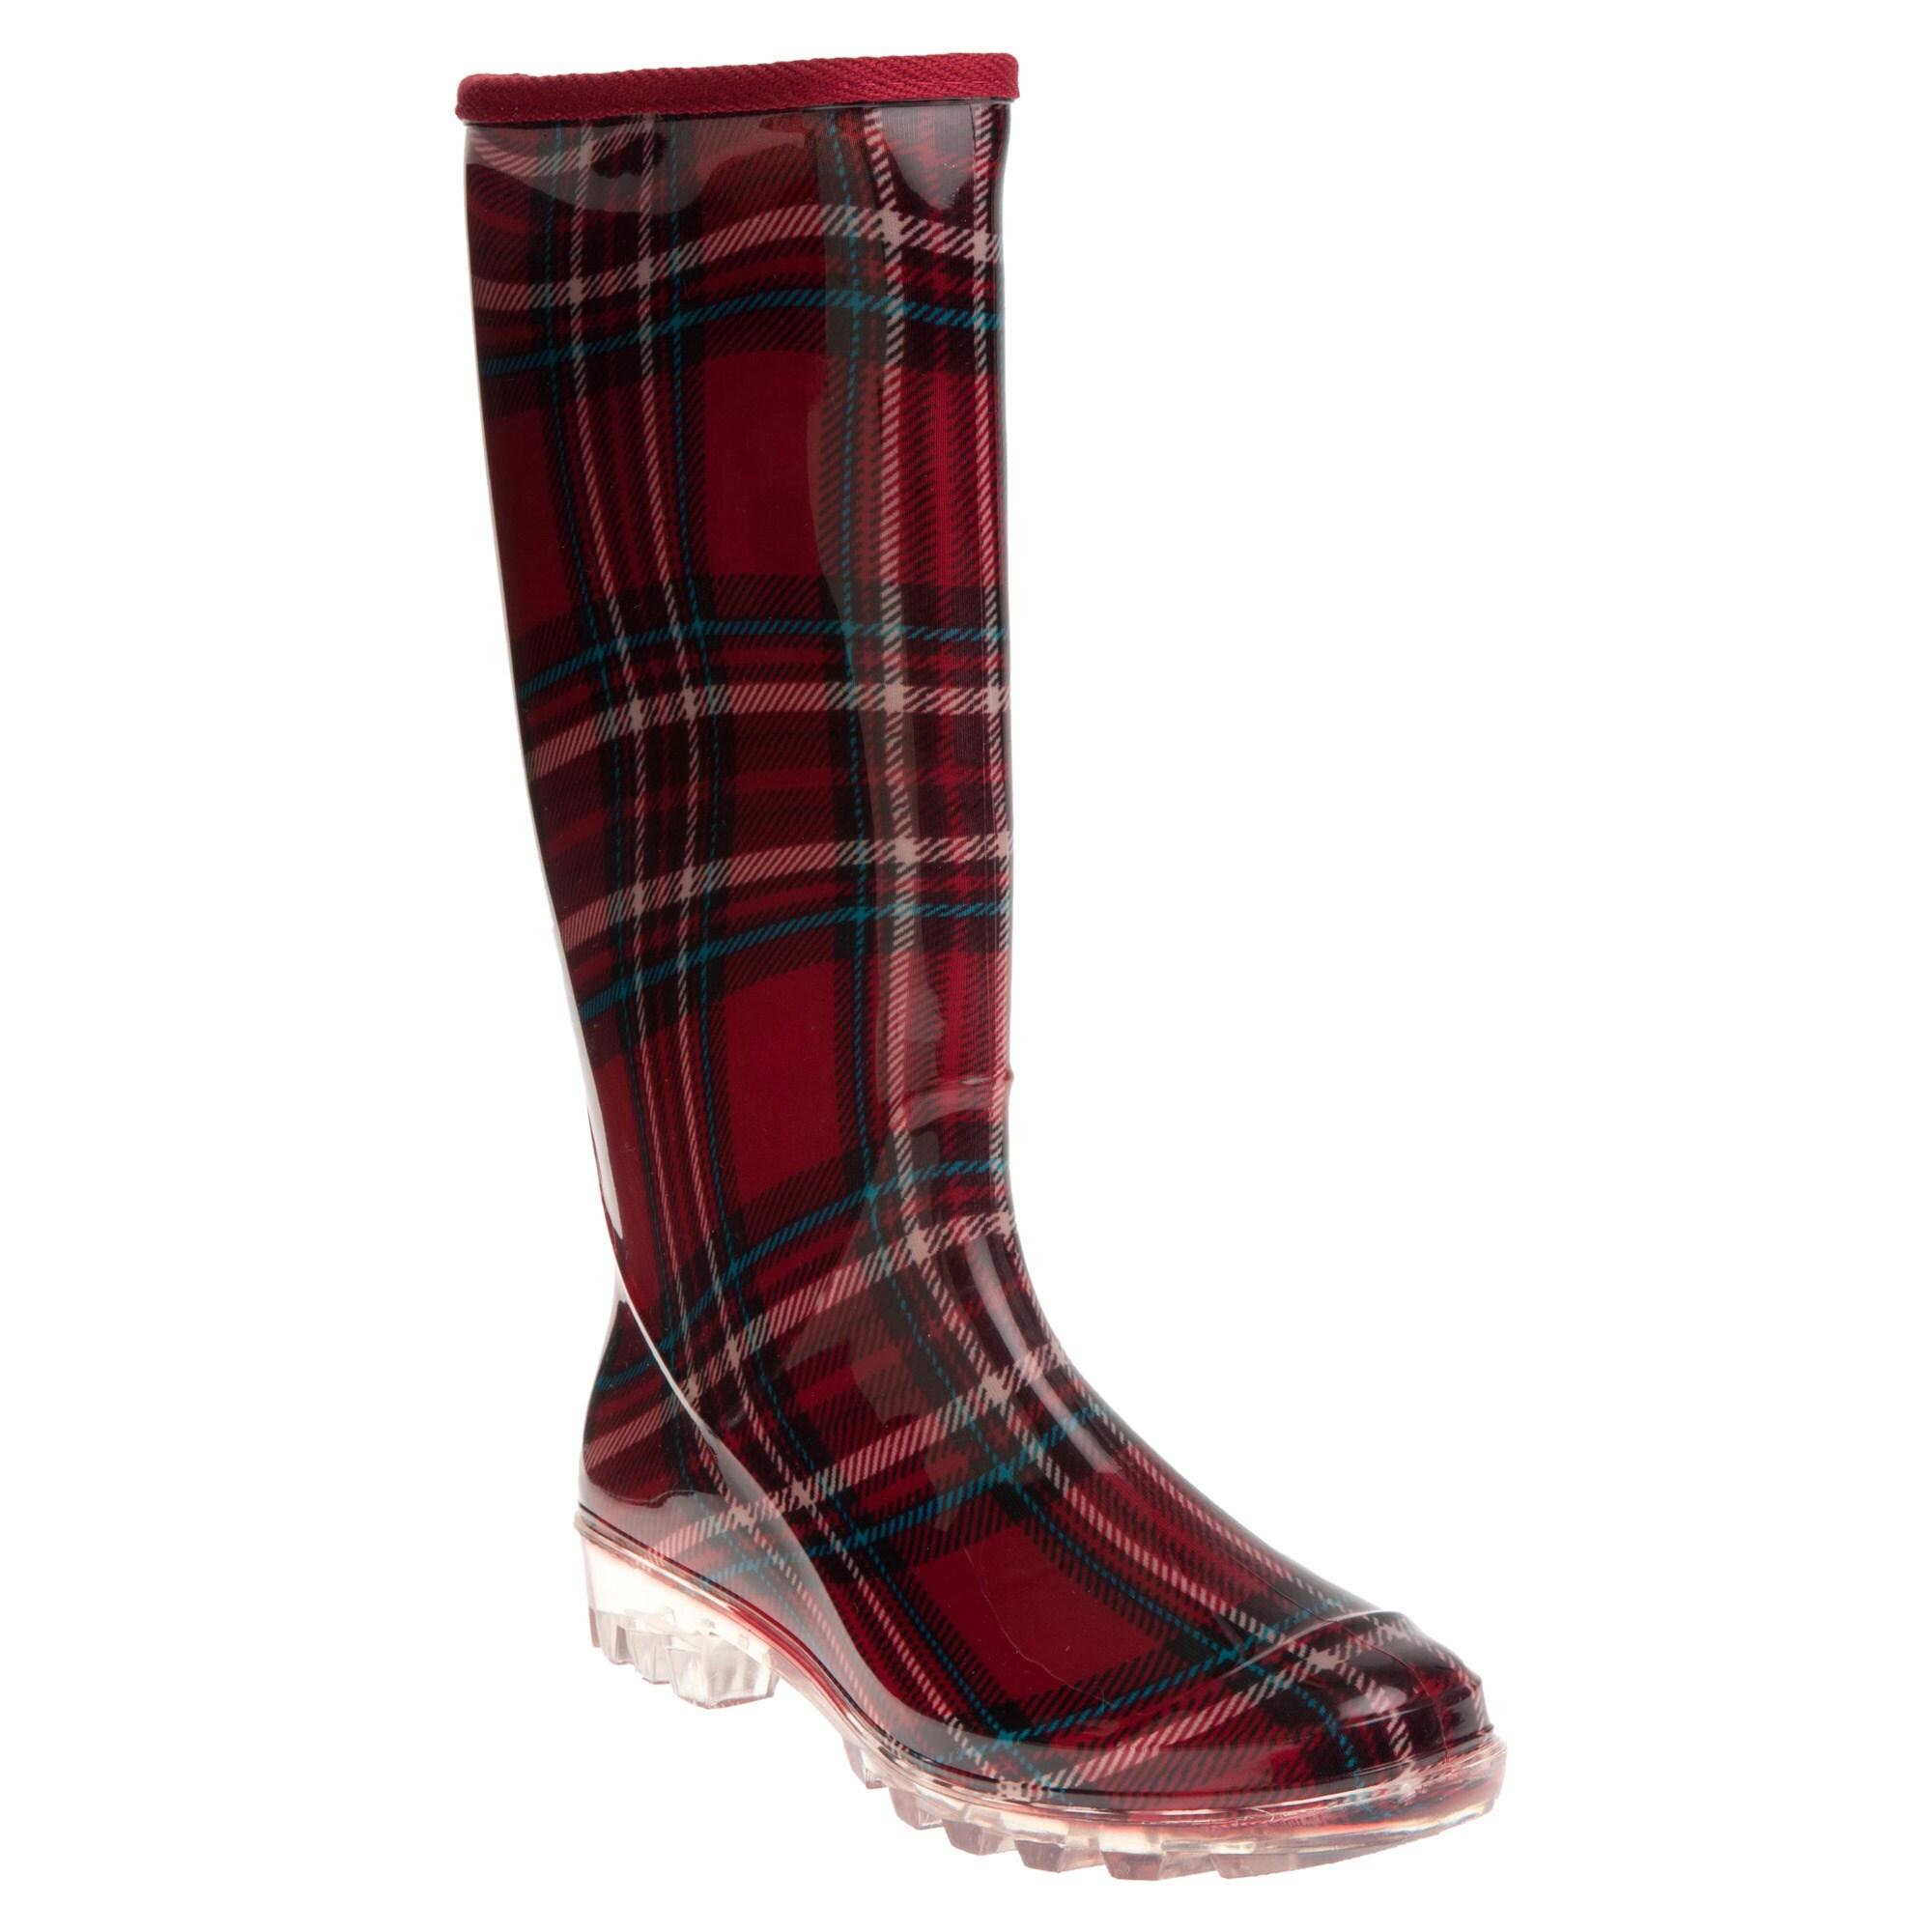 Henry Ferrera Women's Burgundy Plaid Printed Rain Boots at Sears.com